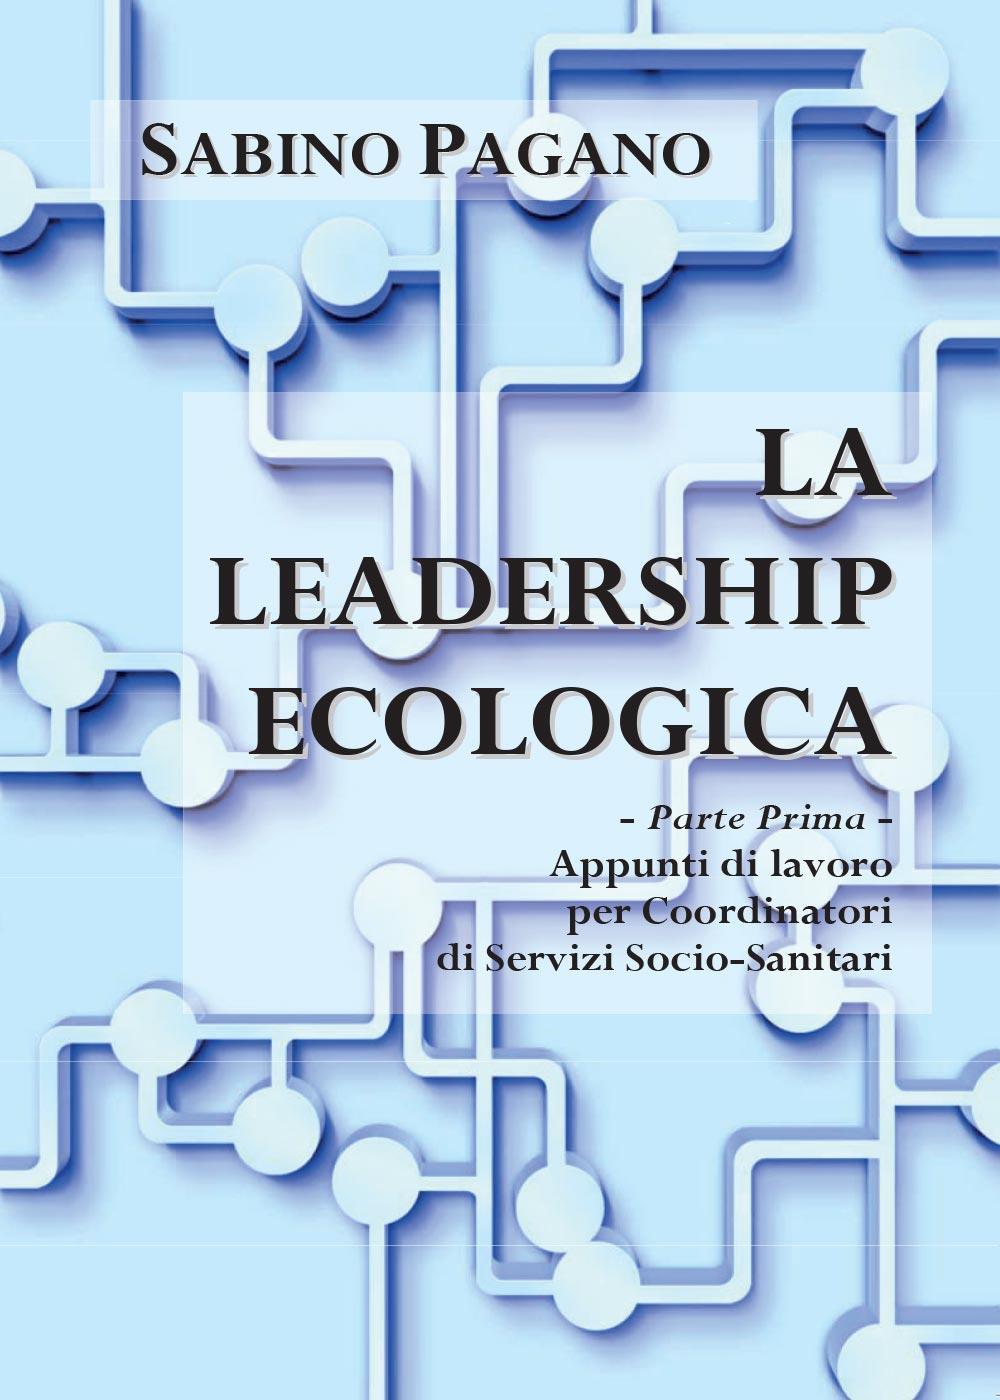 La Leadership Ecologica